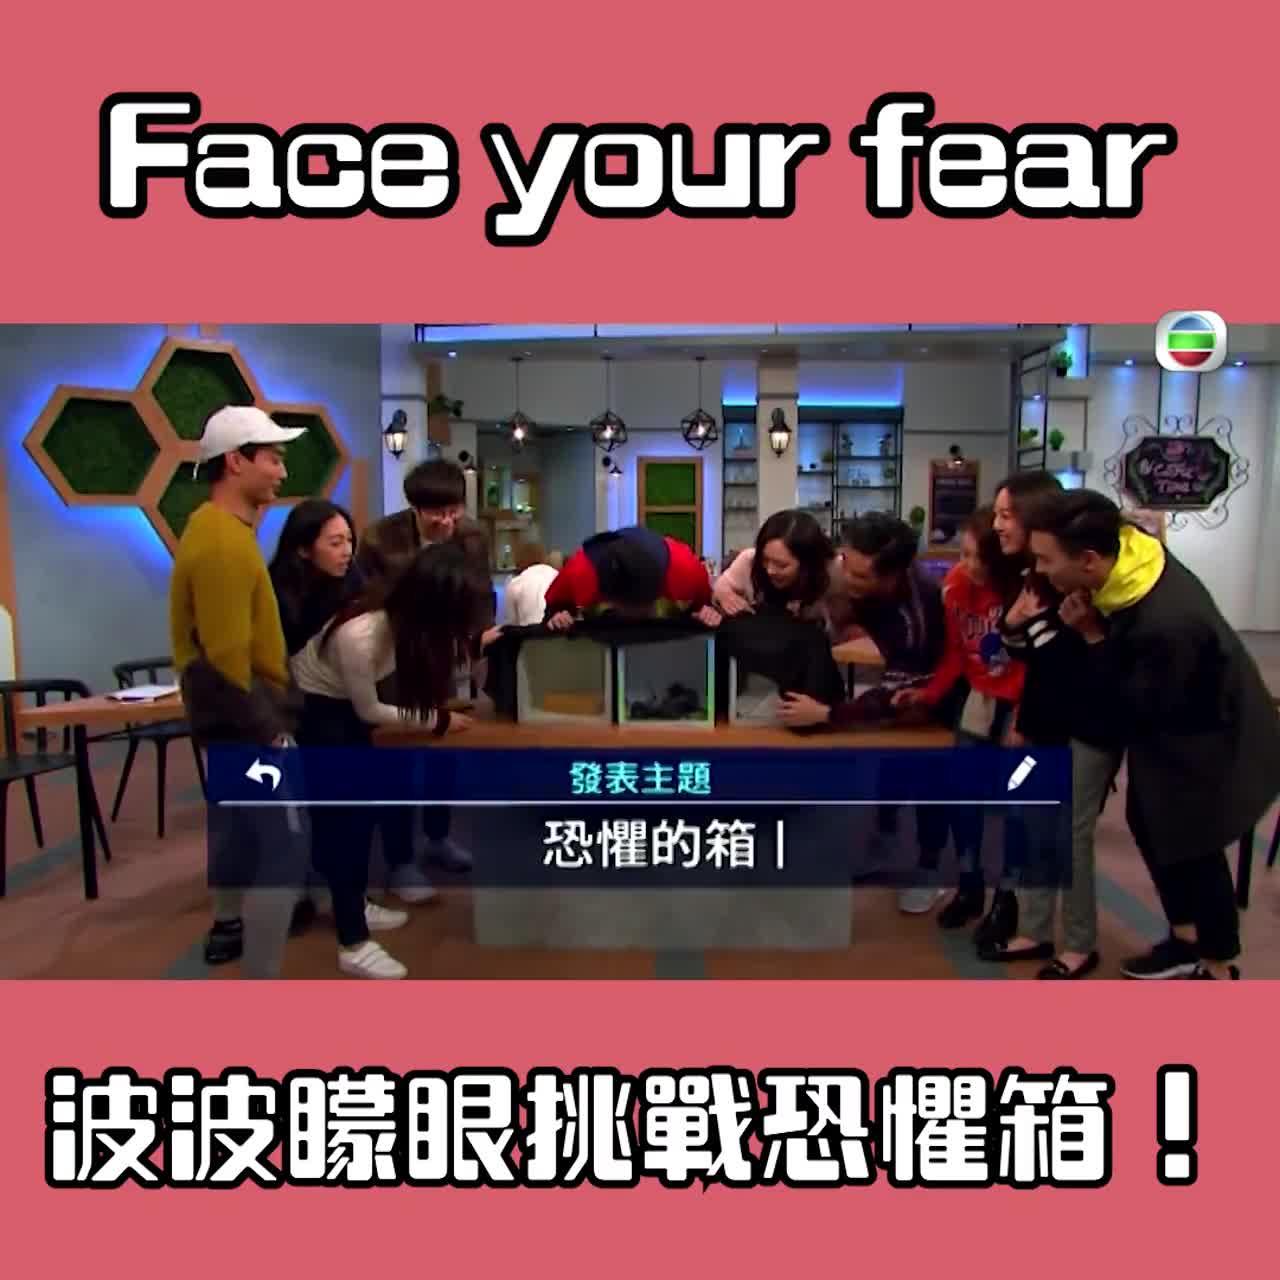 Face your fear! 波波矇眼挑戰恐懼箱!